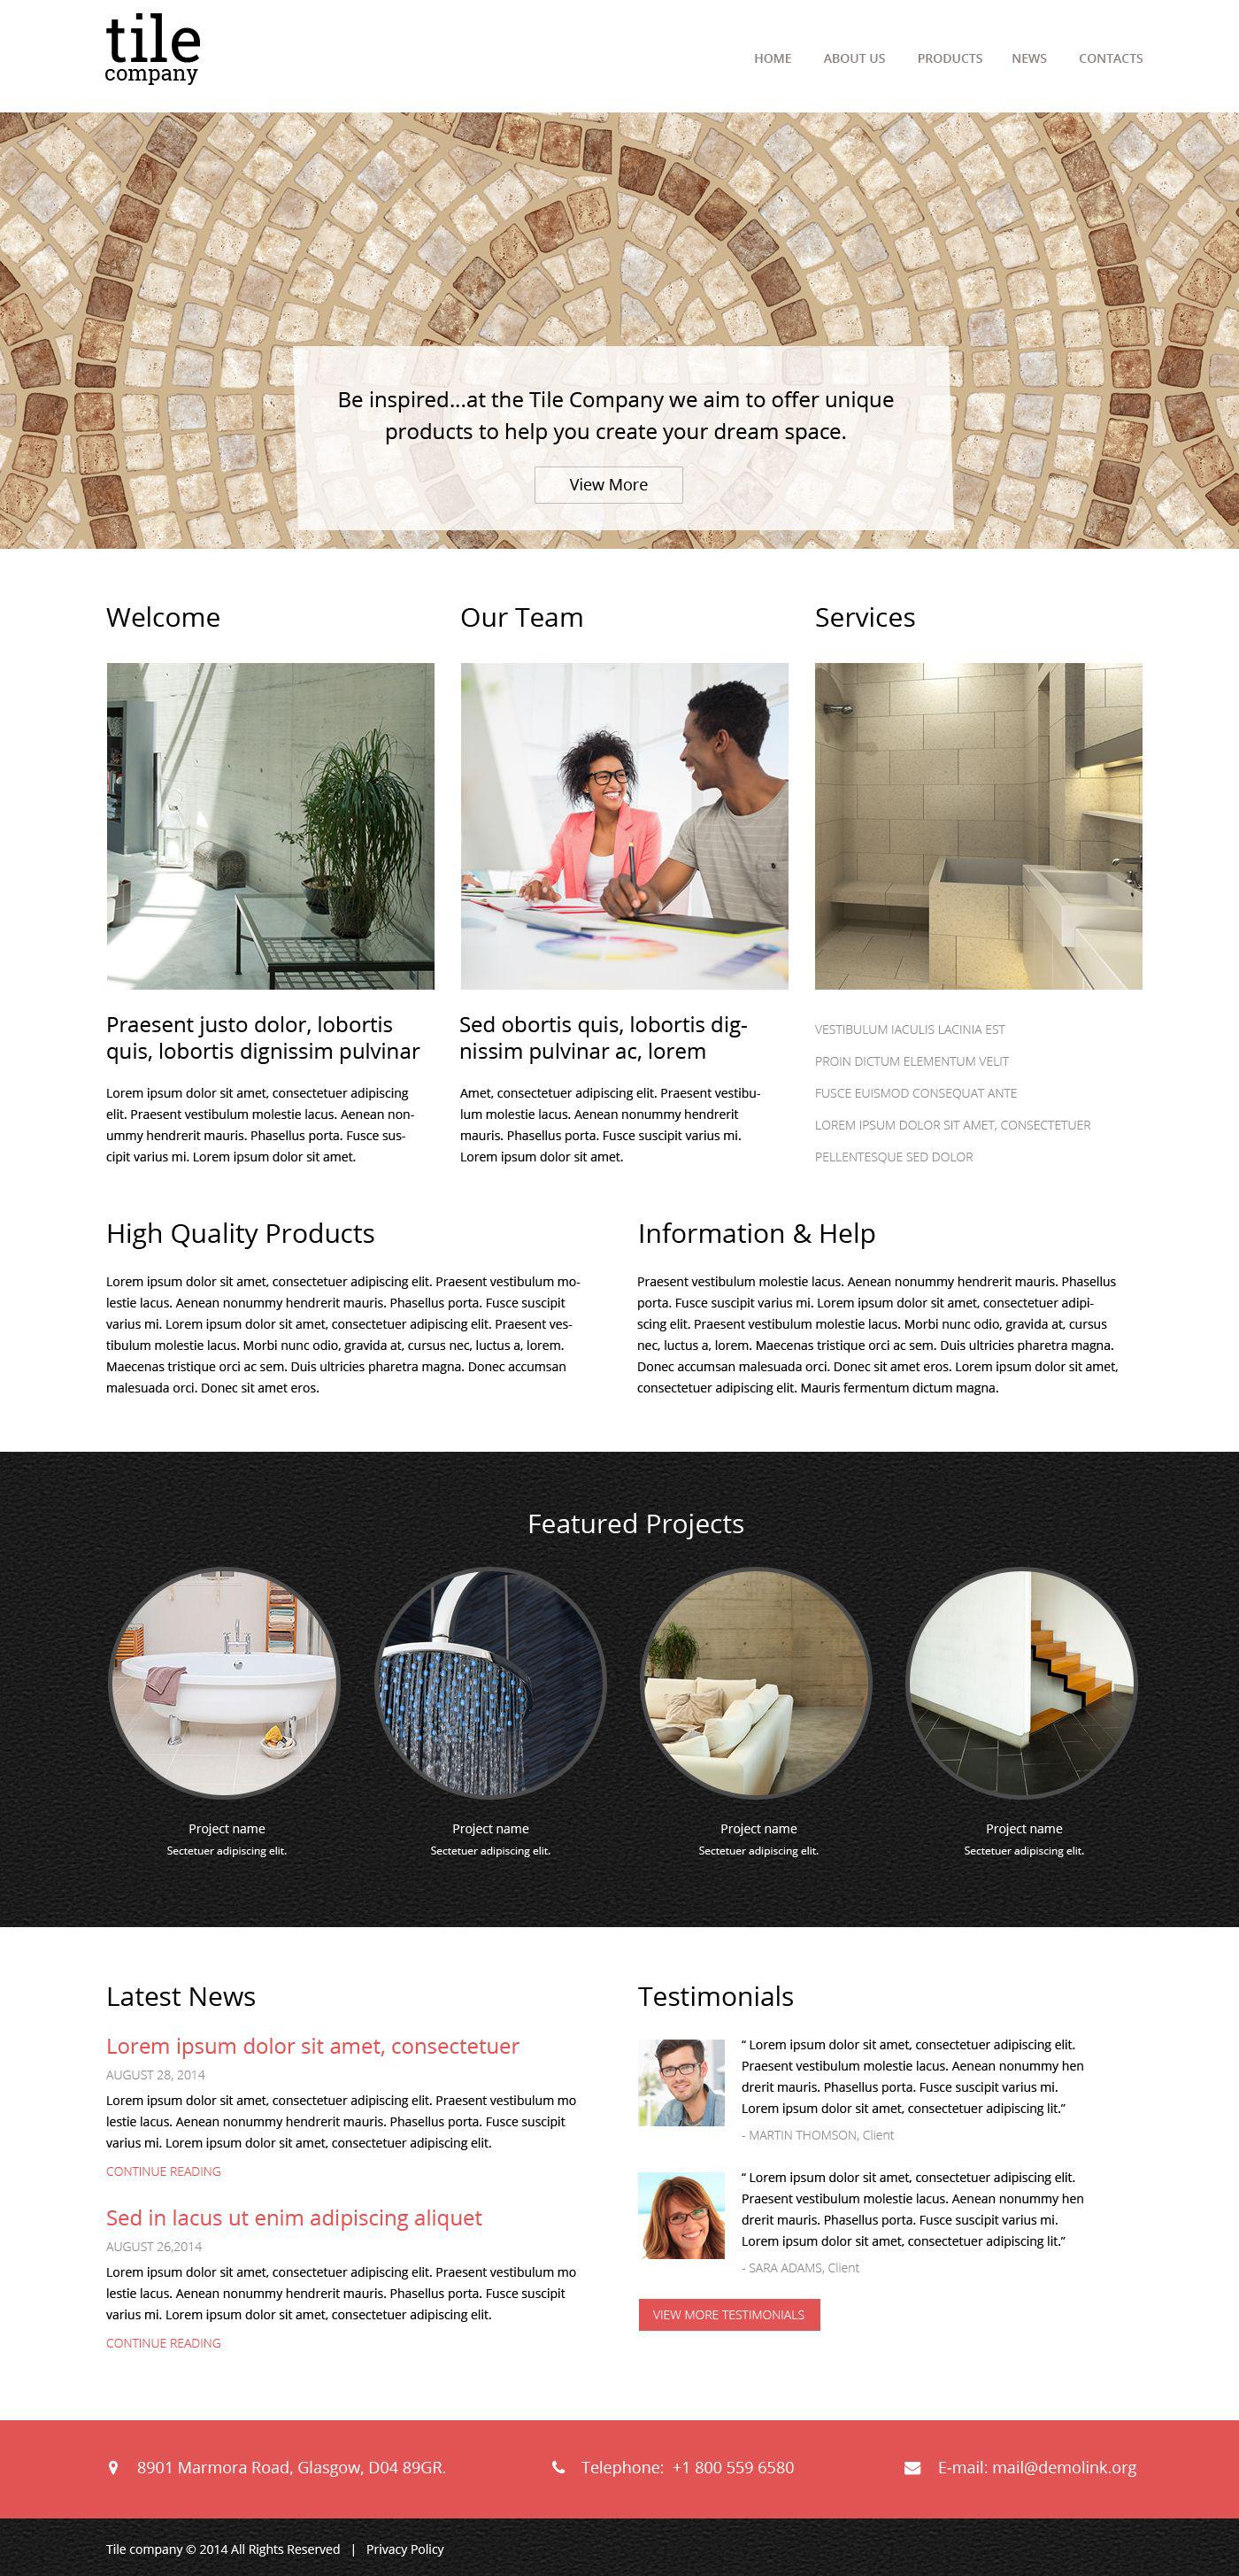 Plantilla Web Responsive para Sitio de Diseño interior #51856 - captura de pantalla